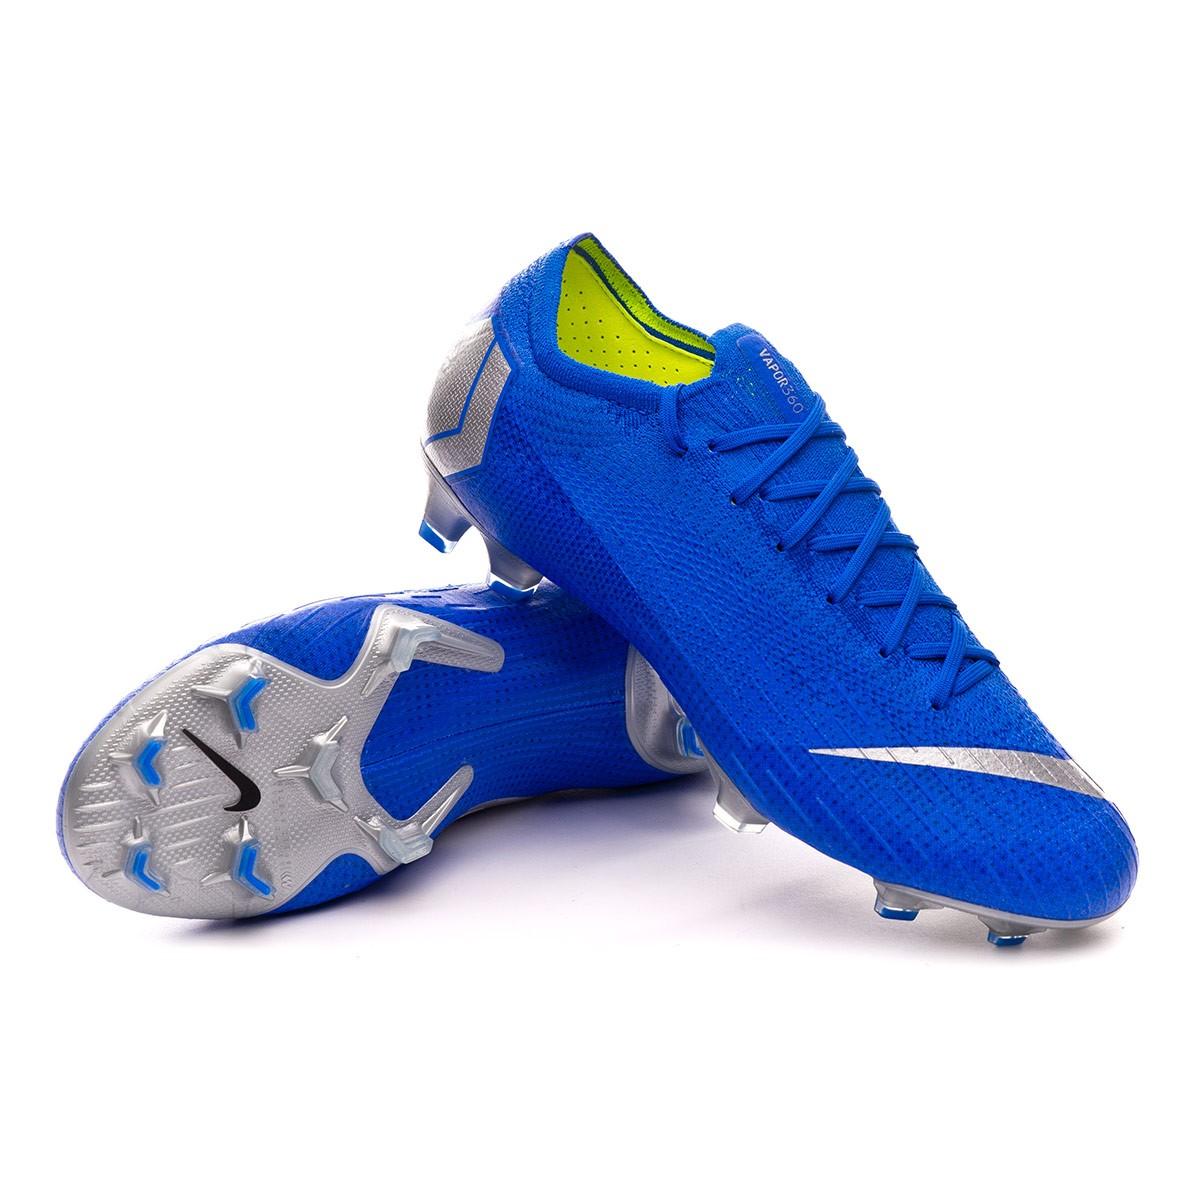 Paseo cuello Remontarse  Football Boots Nike Mercurial Vapor XII Elite FG Racer blue-Matallic  silver-Black - Football store Fútbol Emotion